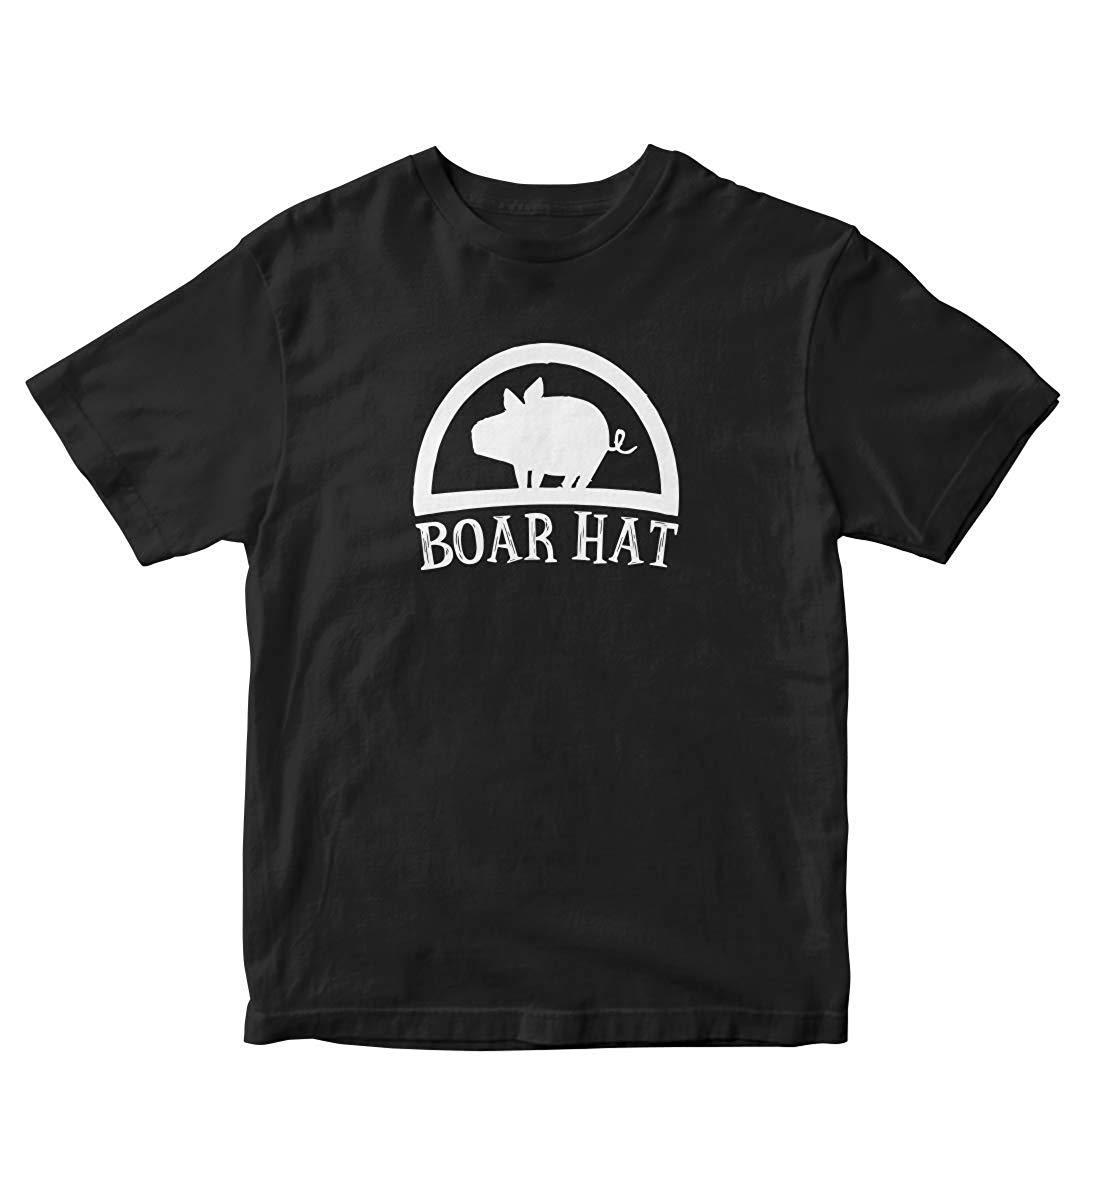 Boar Hat The Seven Deadly Sins Nanatsu No Taiza Anime Manga T Shirt Black A503